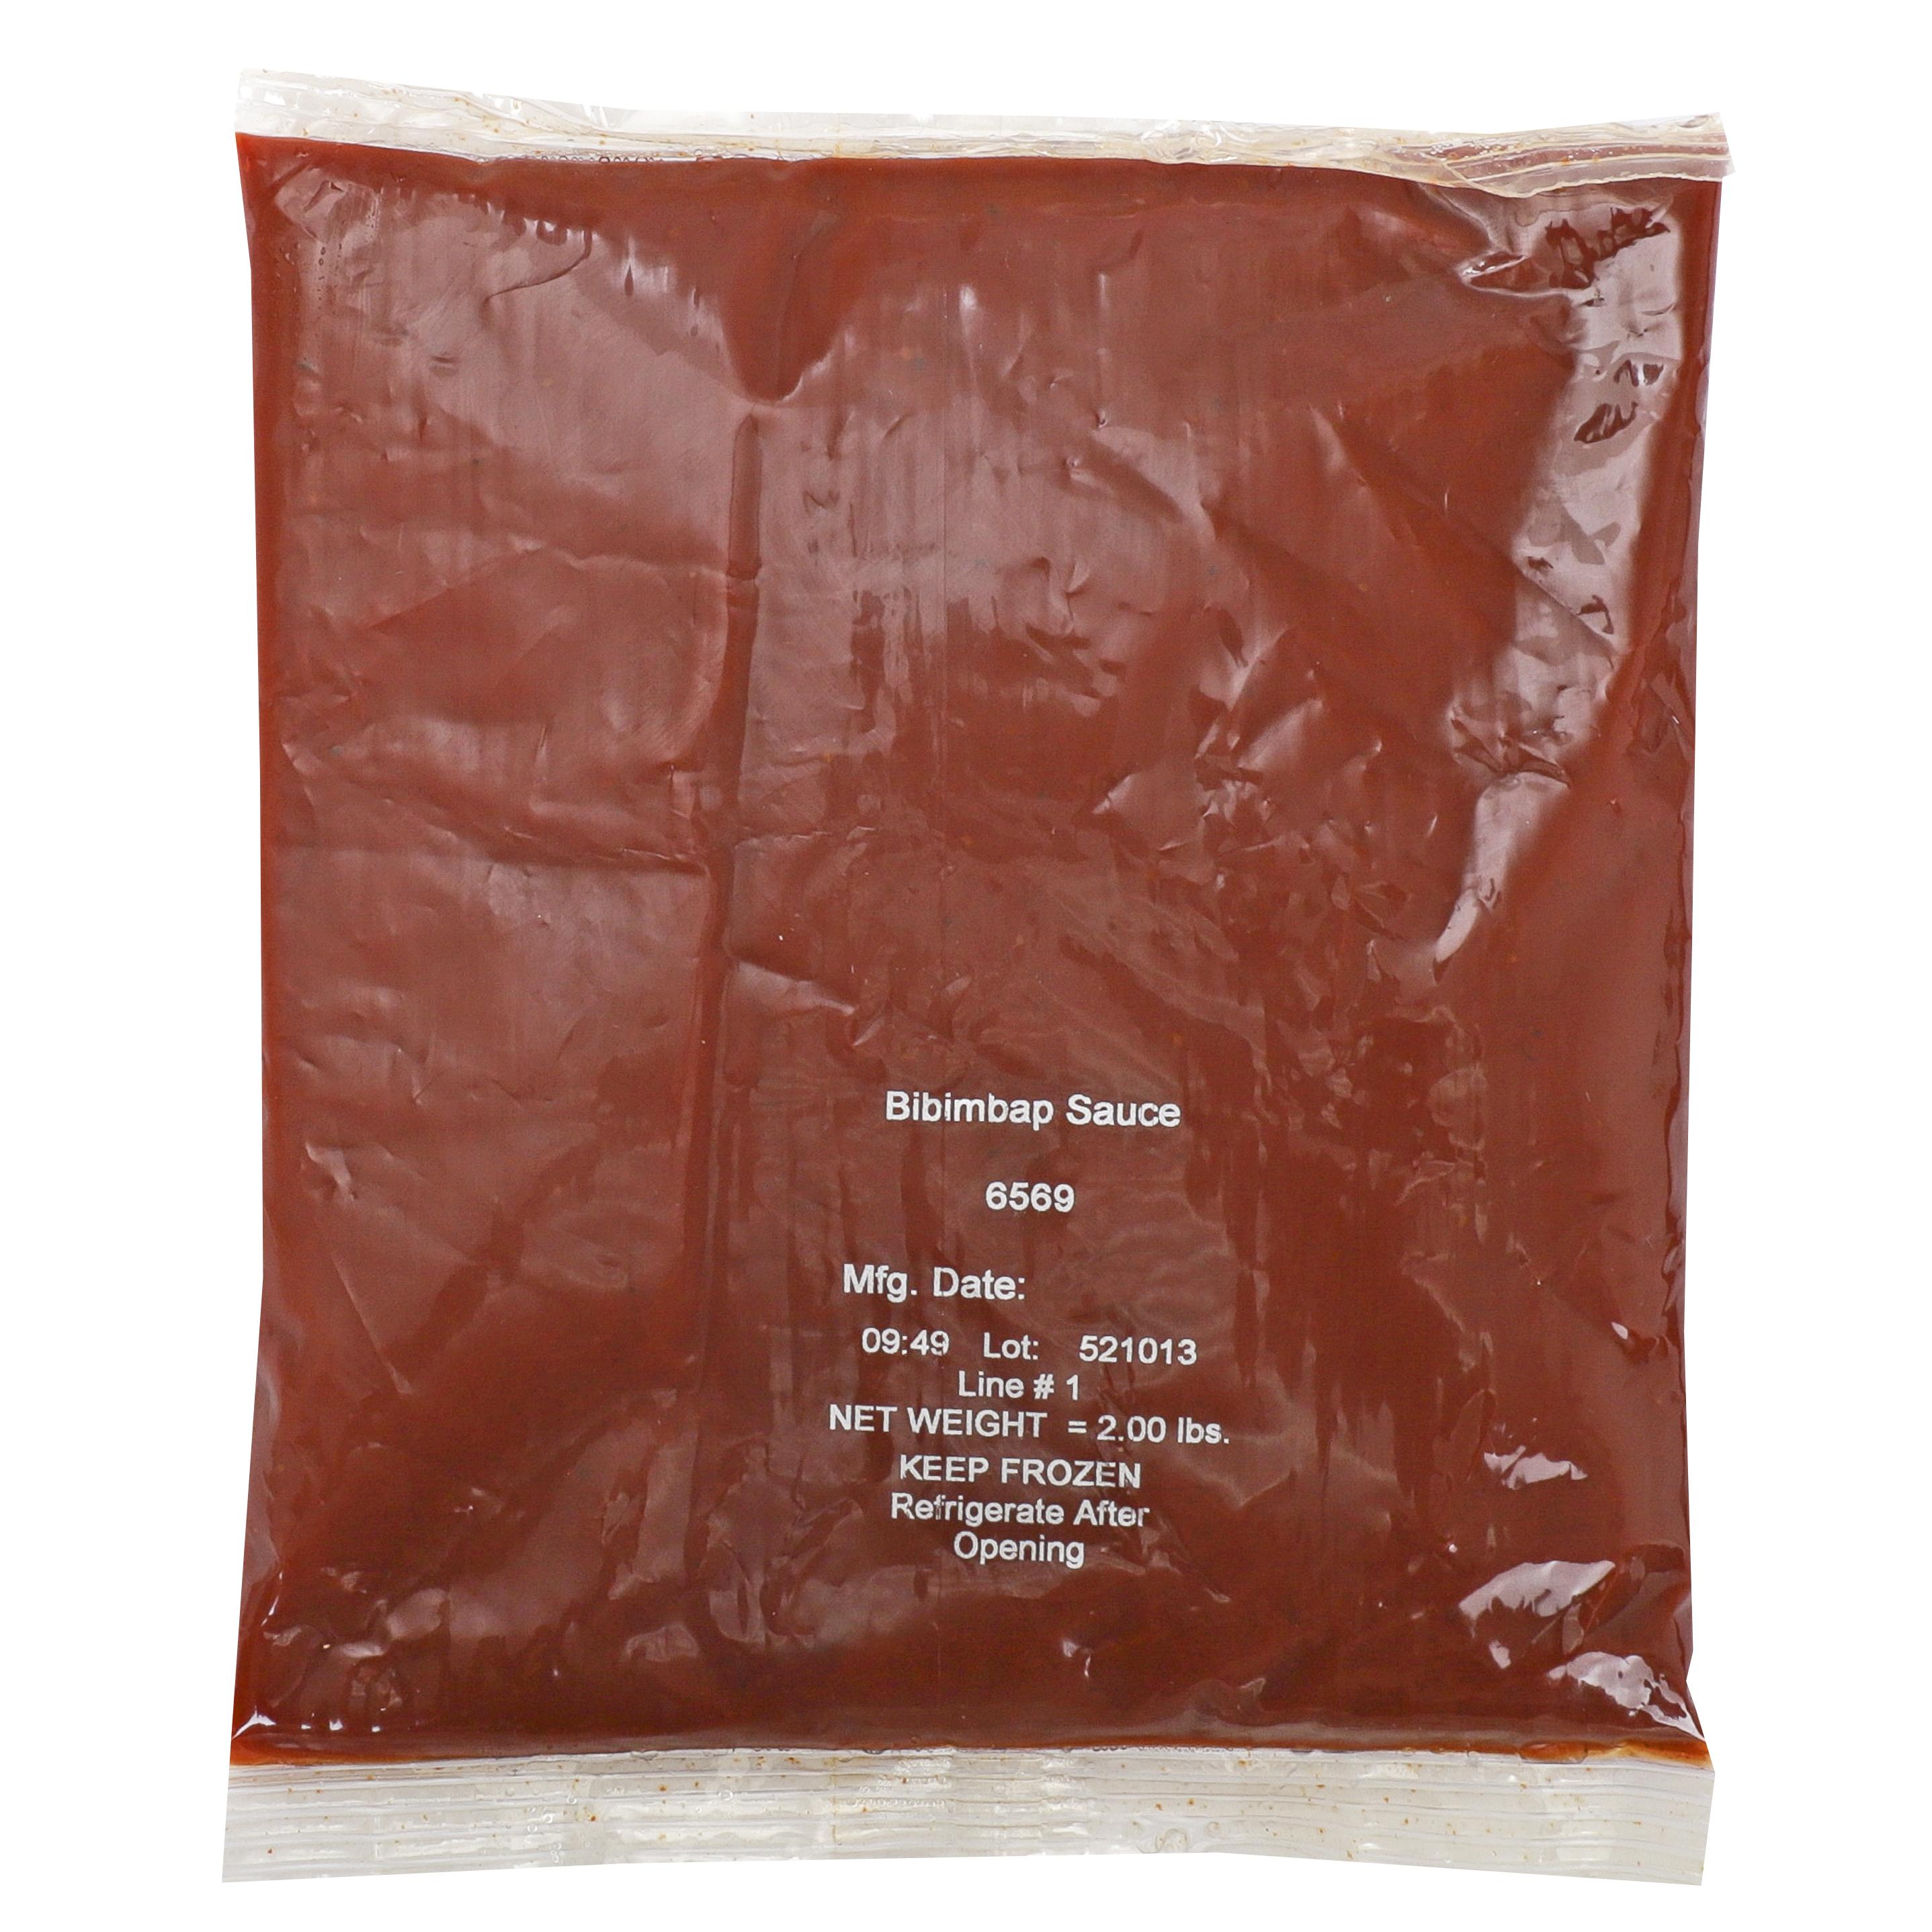 6569 - Passport Global Flavors By Custom Culinary Bibimbap Sauce